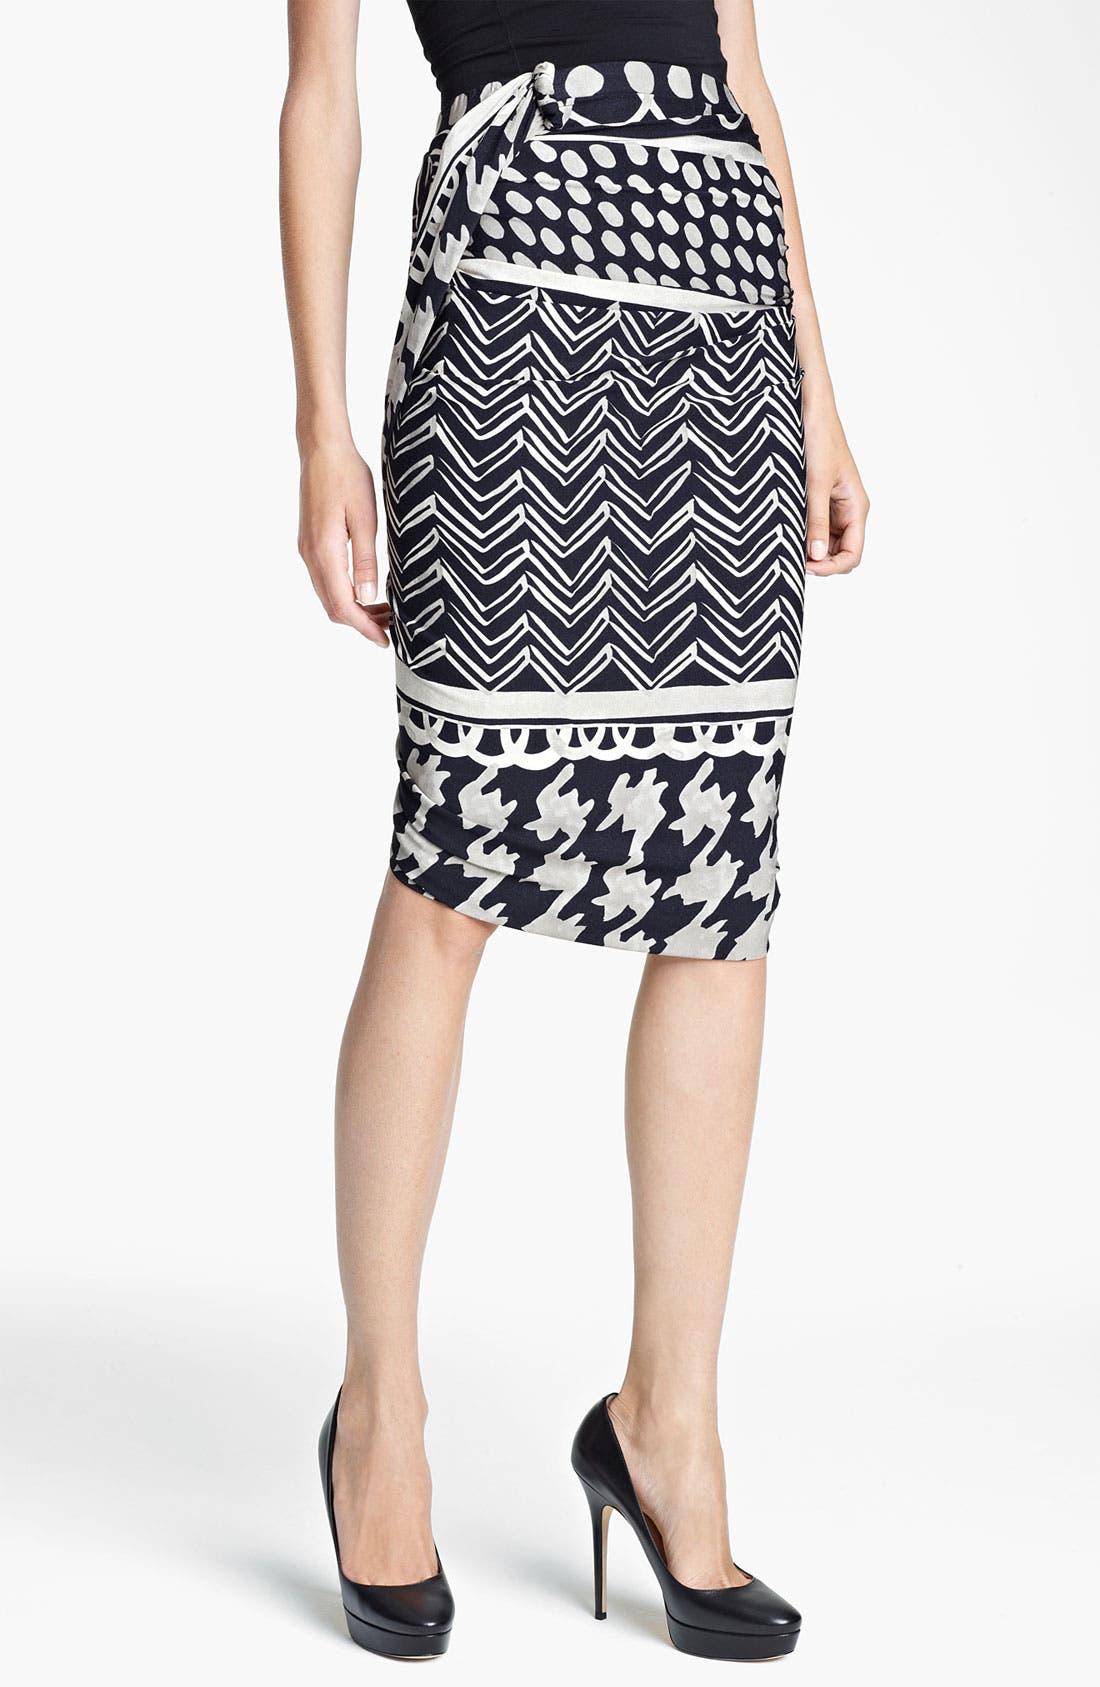 Main Image - Max Mara 'Ombrato' Print Jersey Tulip Skirt